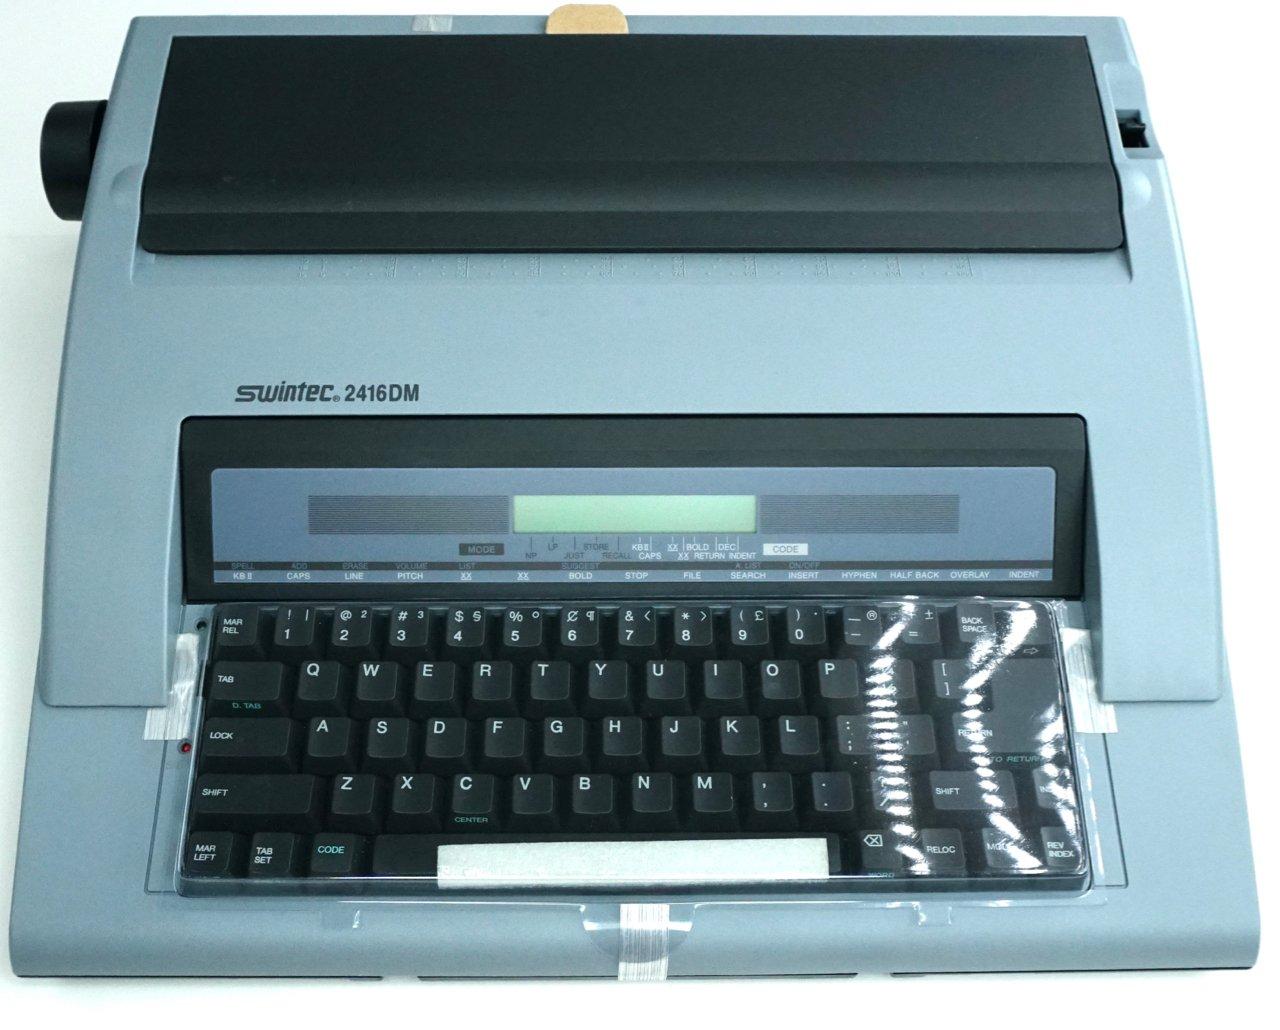 Brand New Swintec 2416DM Electronic Portable Typewriter (128K Memory)